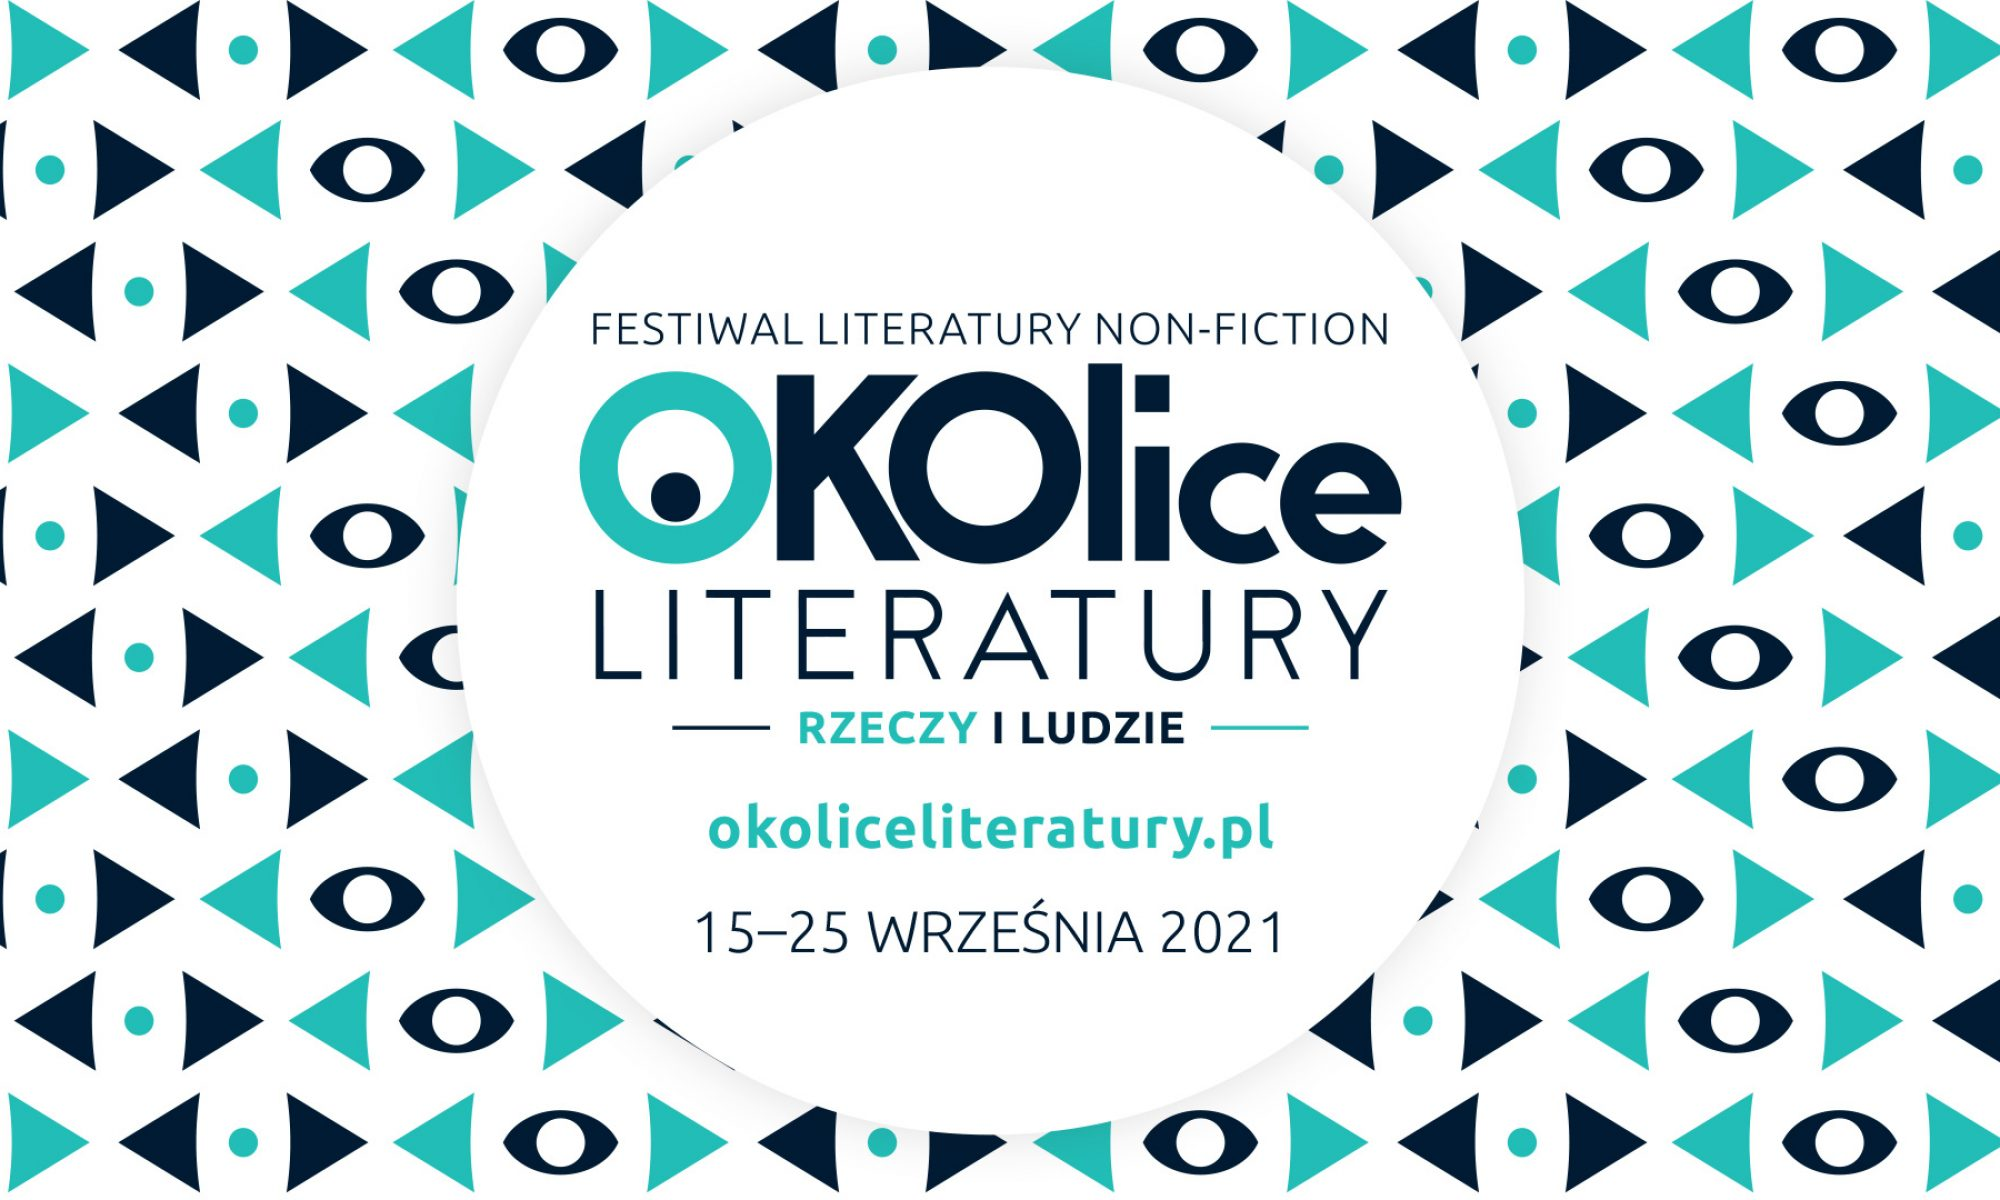 OKOlice Literatury